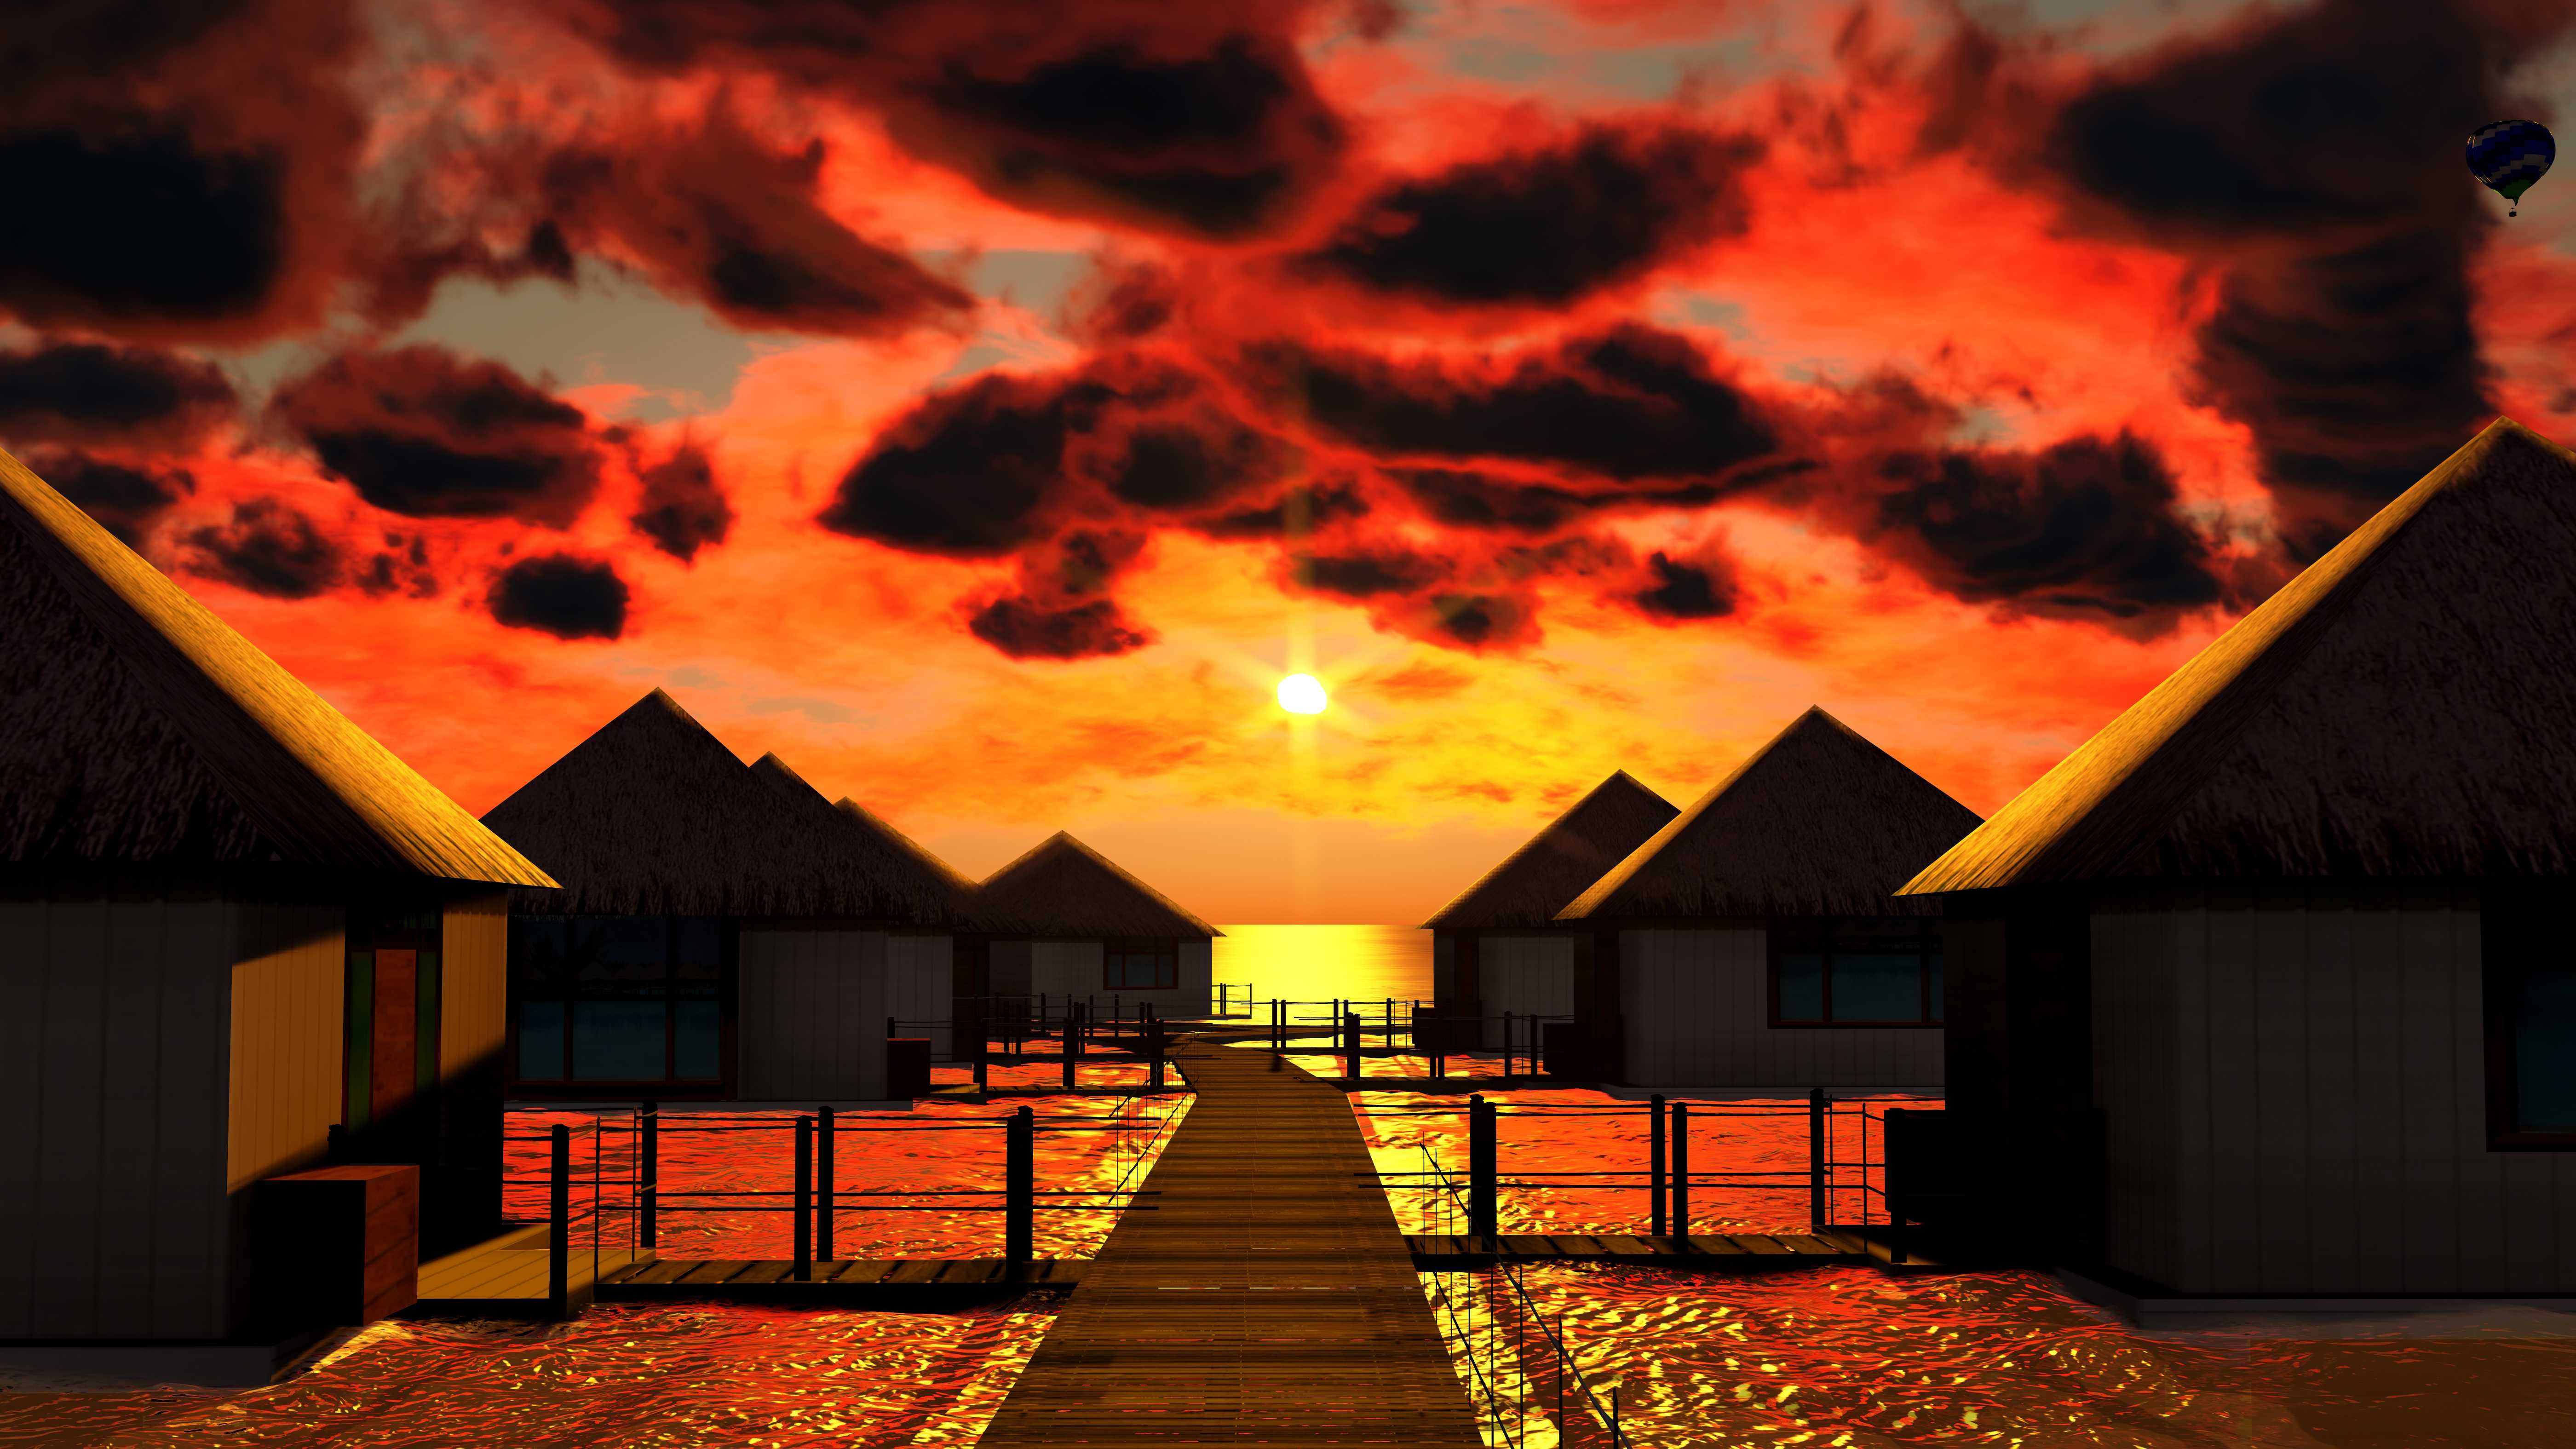 Bora Bora Sunset Bora Bora Sunset Wallpaper Wallpaper Hd Background Desktop Beautiful Places To Visit Dream Vacations Beautiful Places